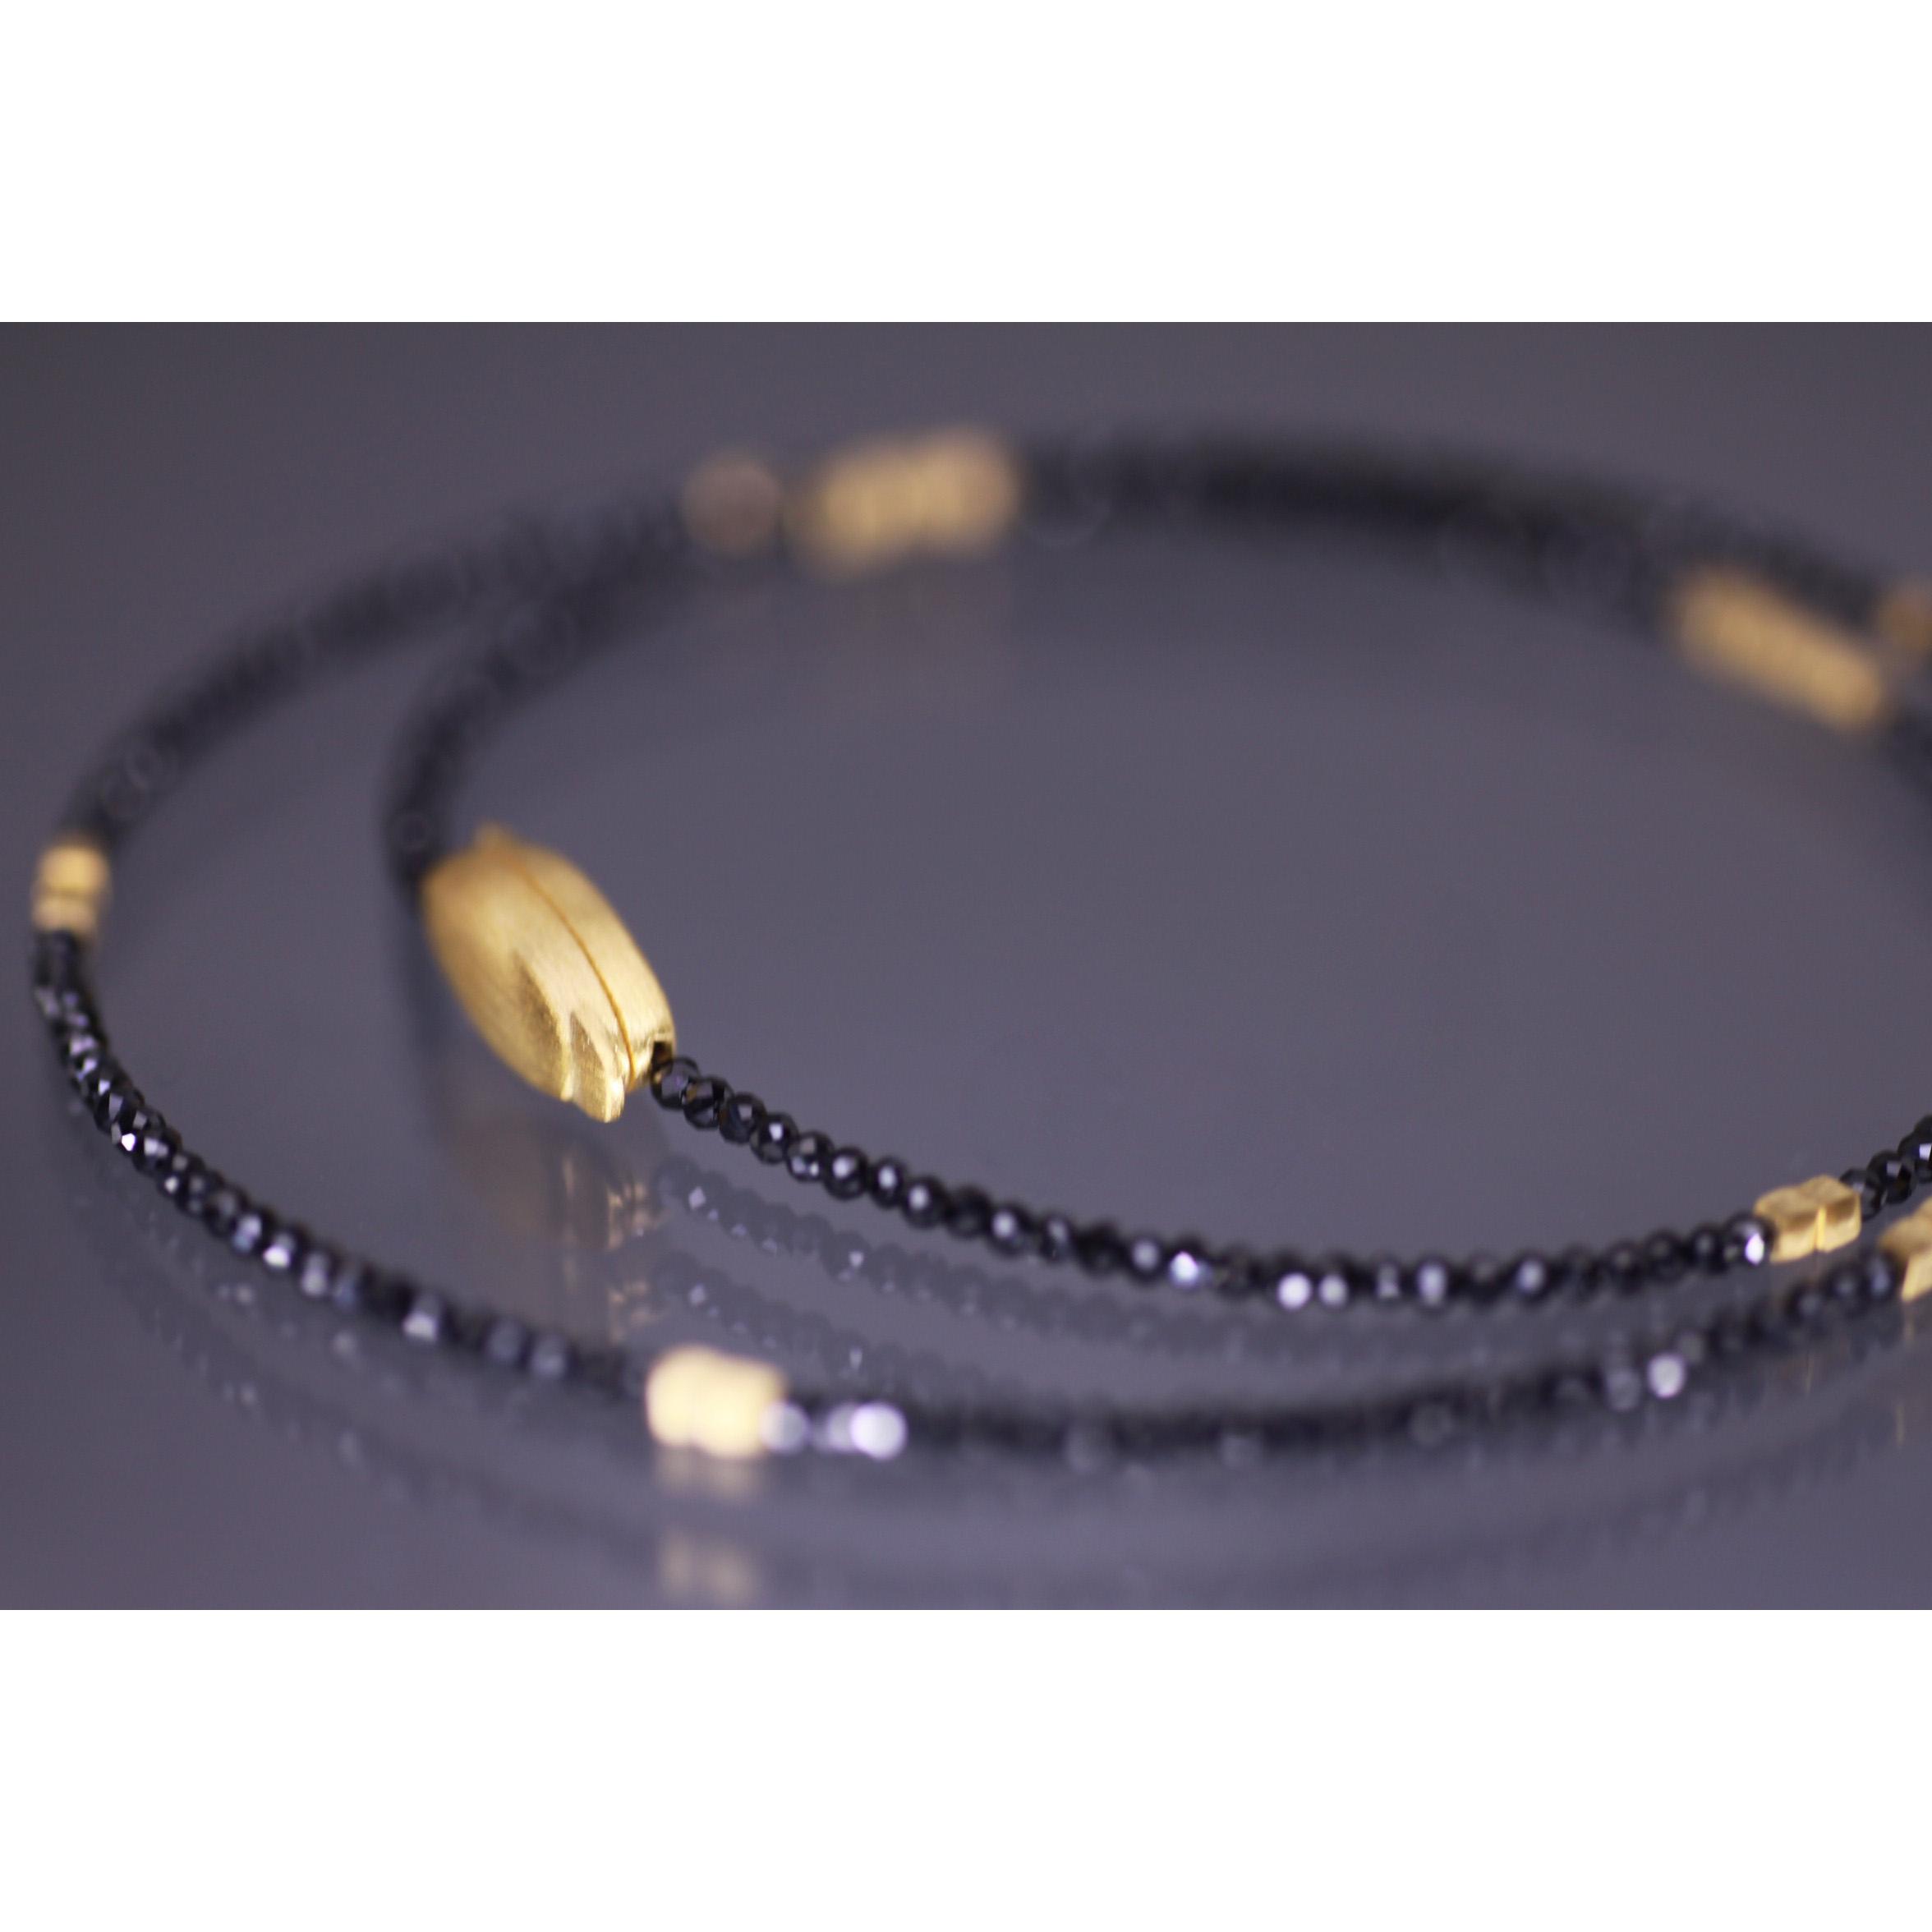 Lindenau Single Strand Black Spinel Necklace